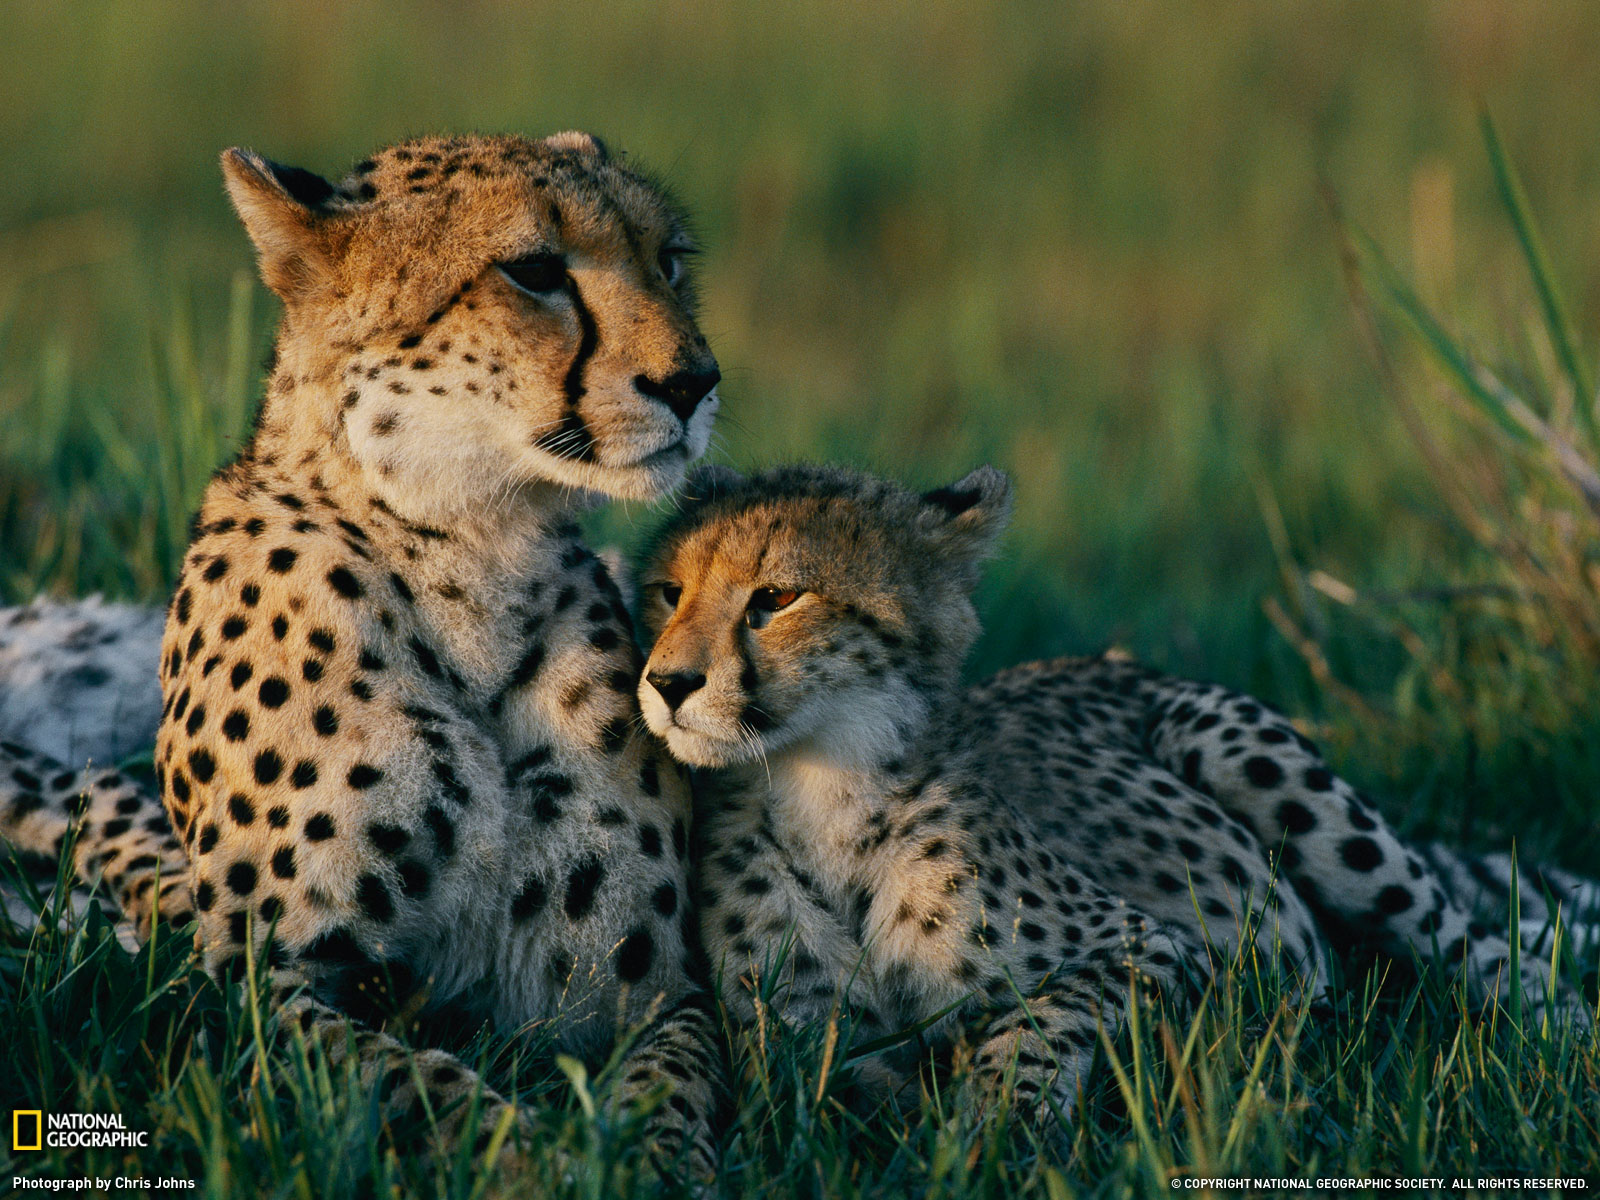 Baby Cheetah Wallpapers 1080p - Wickedsa com